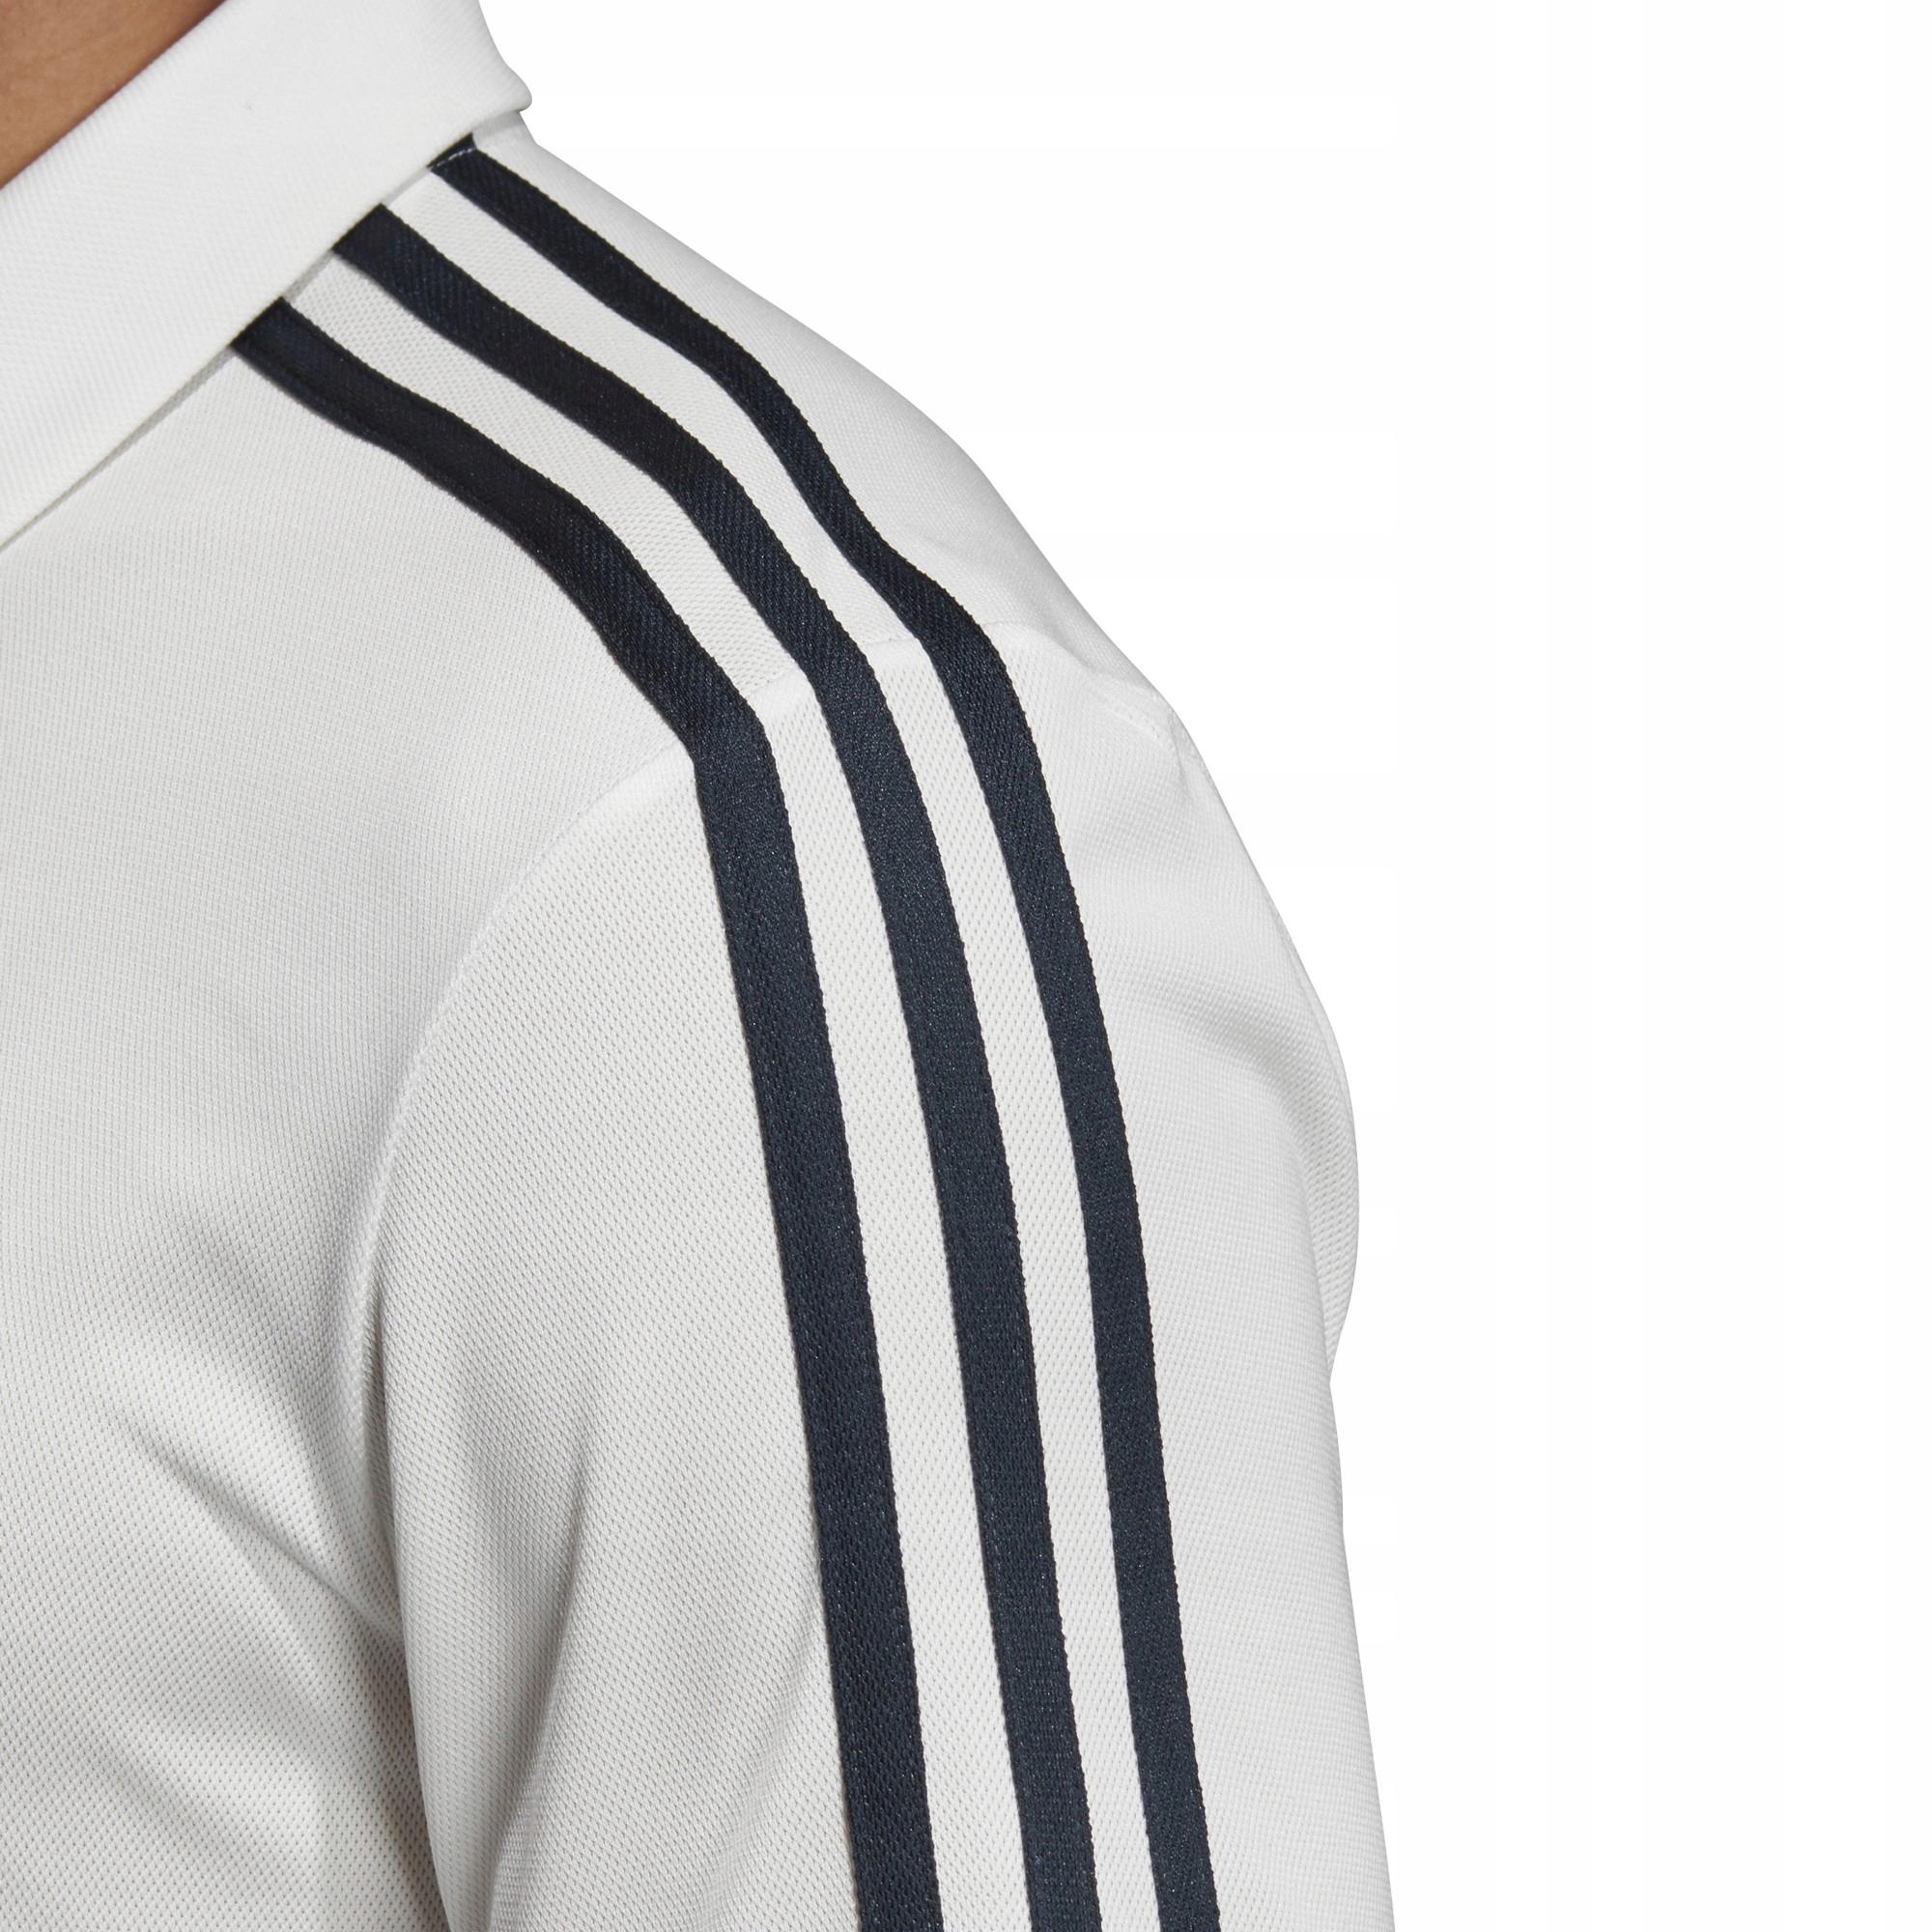 c03addb5 Koszulka Polo adidas REAL MADRYT (CW8669) r.L - 7438236766 ...